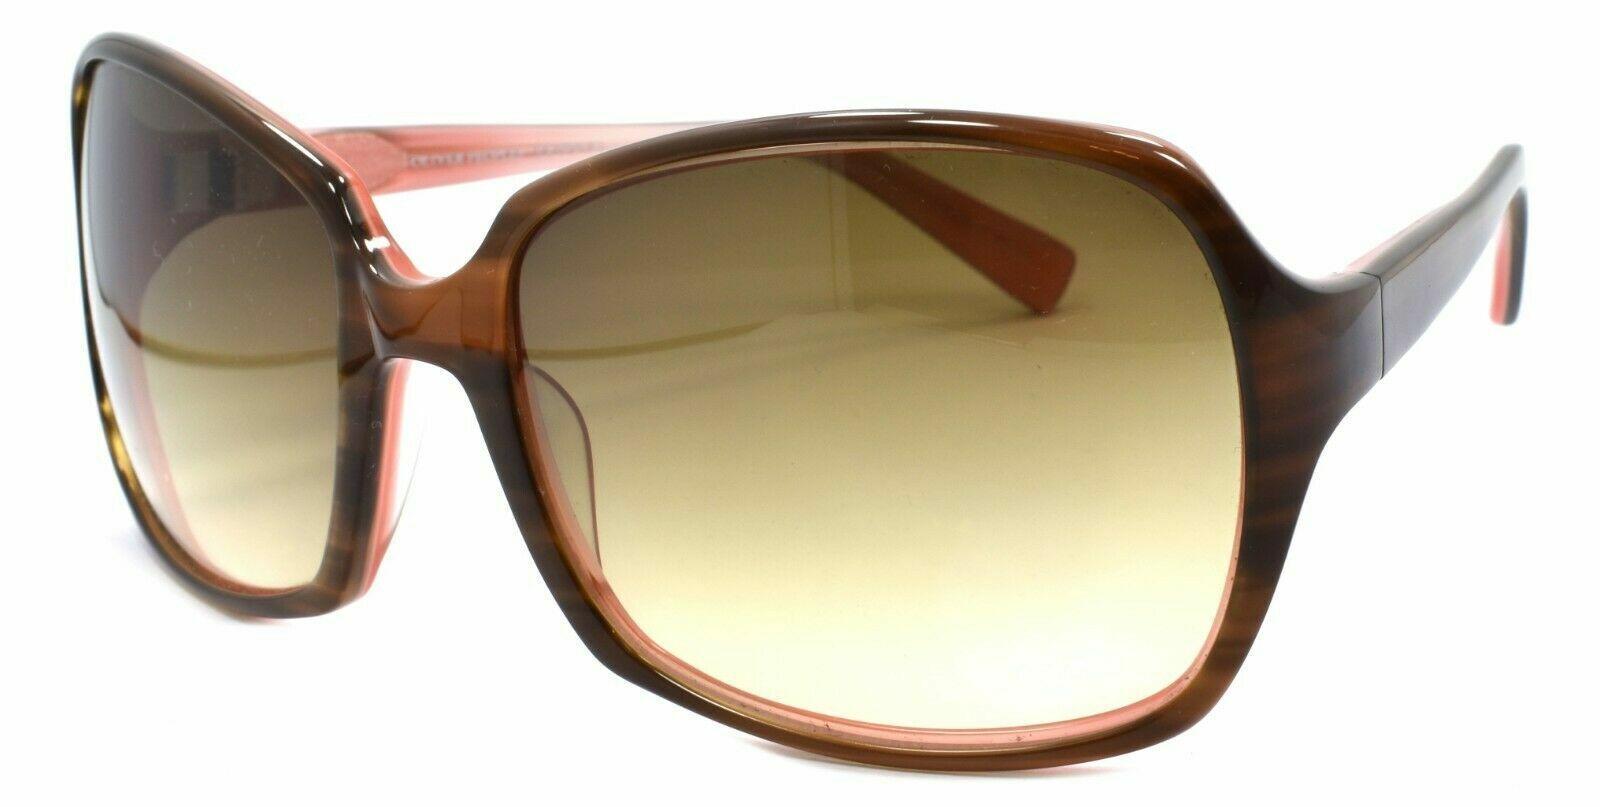 AUTHENTIC Oliver Peoples Sunglasses Candice OTPI [59-18-125]